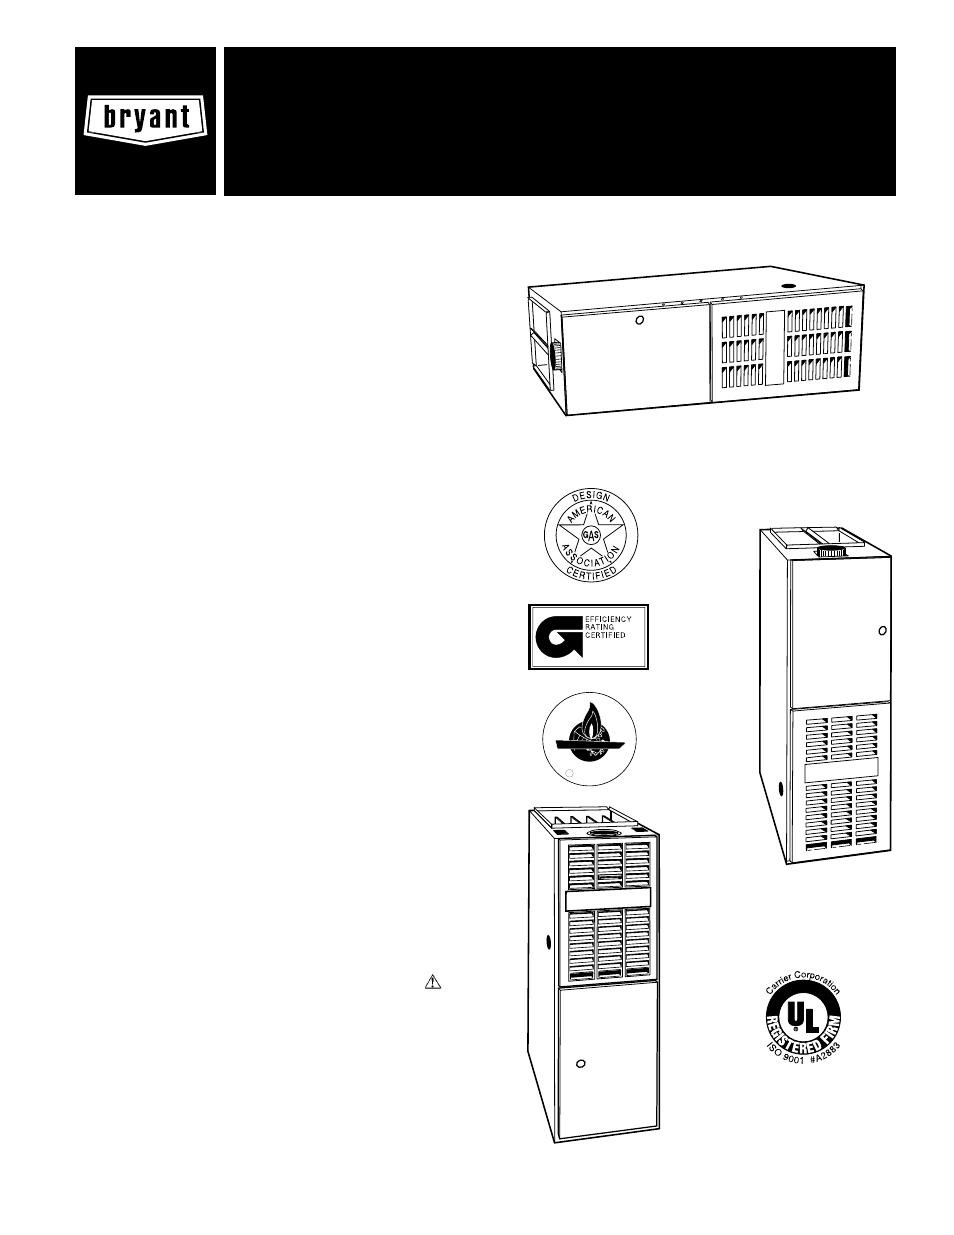 Bryant 395cav Wiring Diagram : 28 Wiring Diagram Images